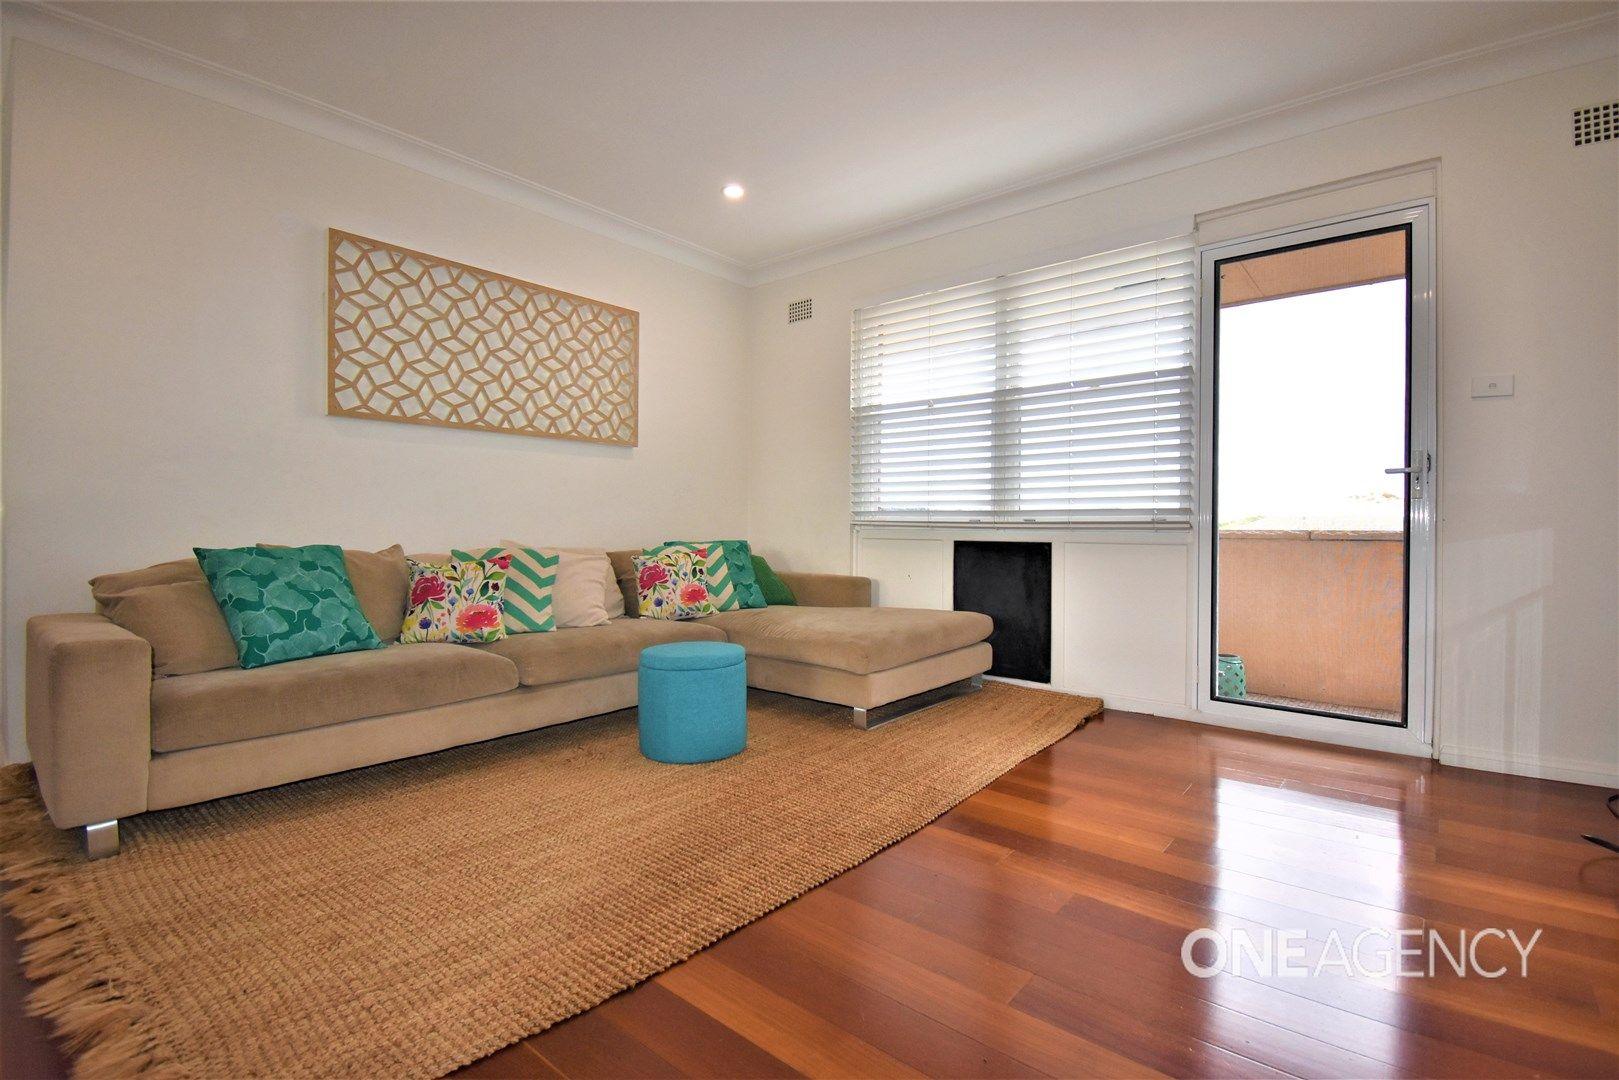 6/295 Maroubra Road, Maroubra NSW 2035, Image 0